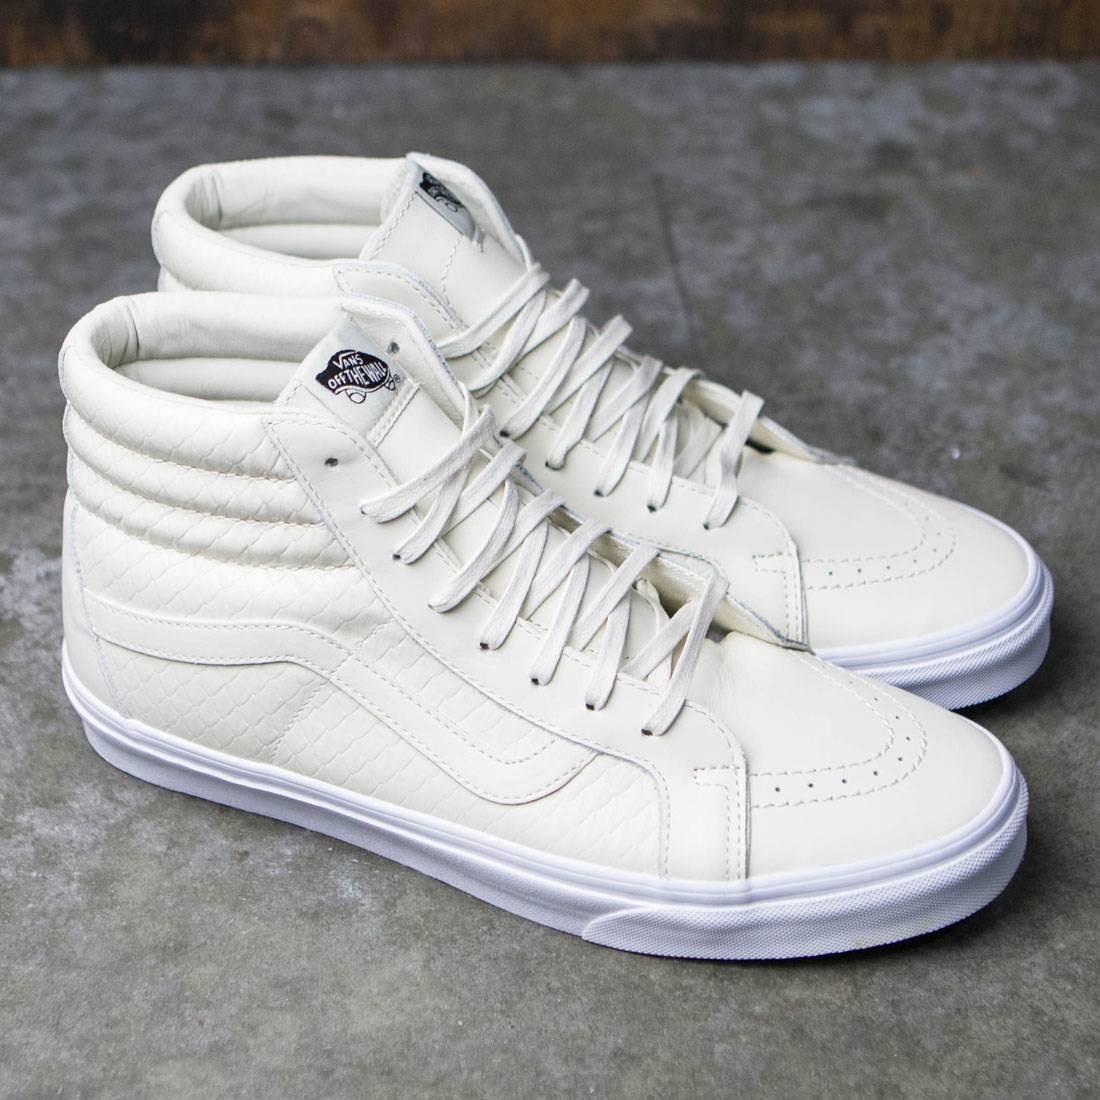 22d7aecedeb Vans Men Sk8-Hi Reissue DX - Armor Leather (white / turtledove)